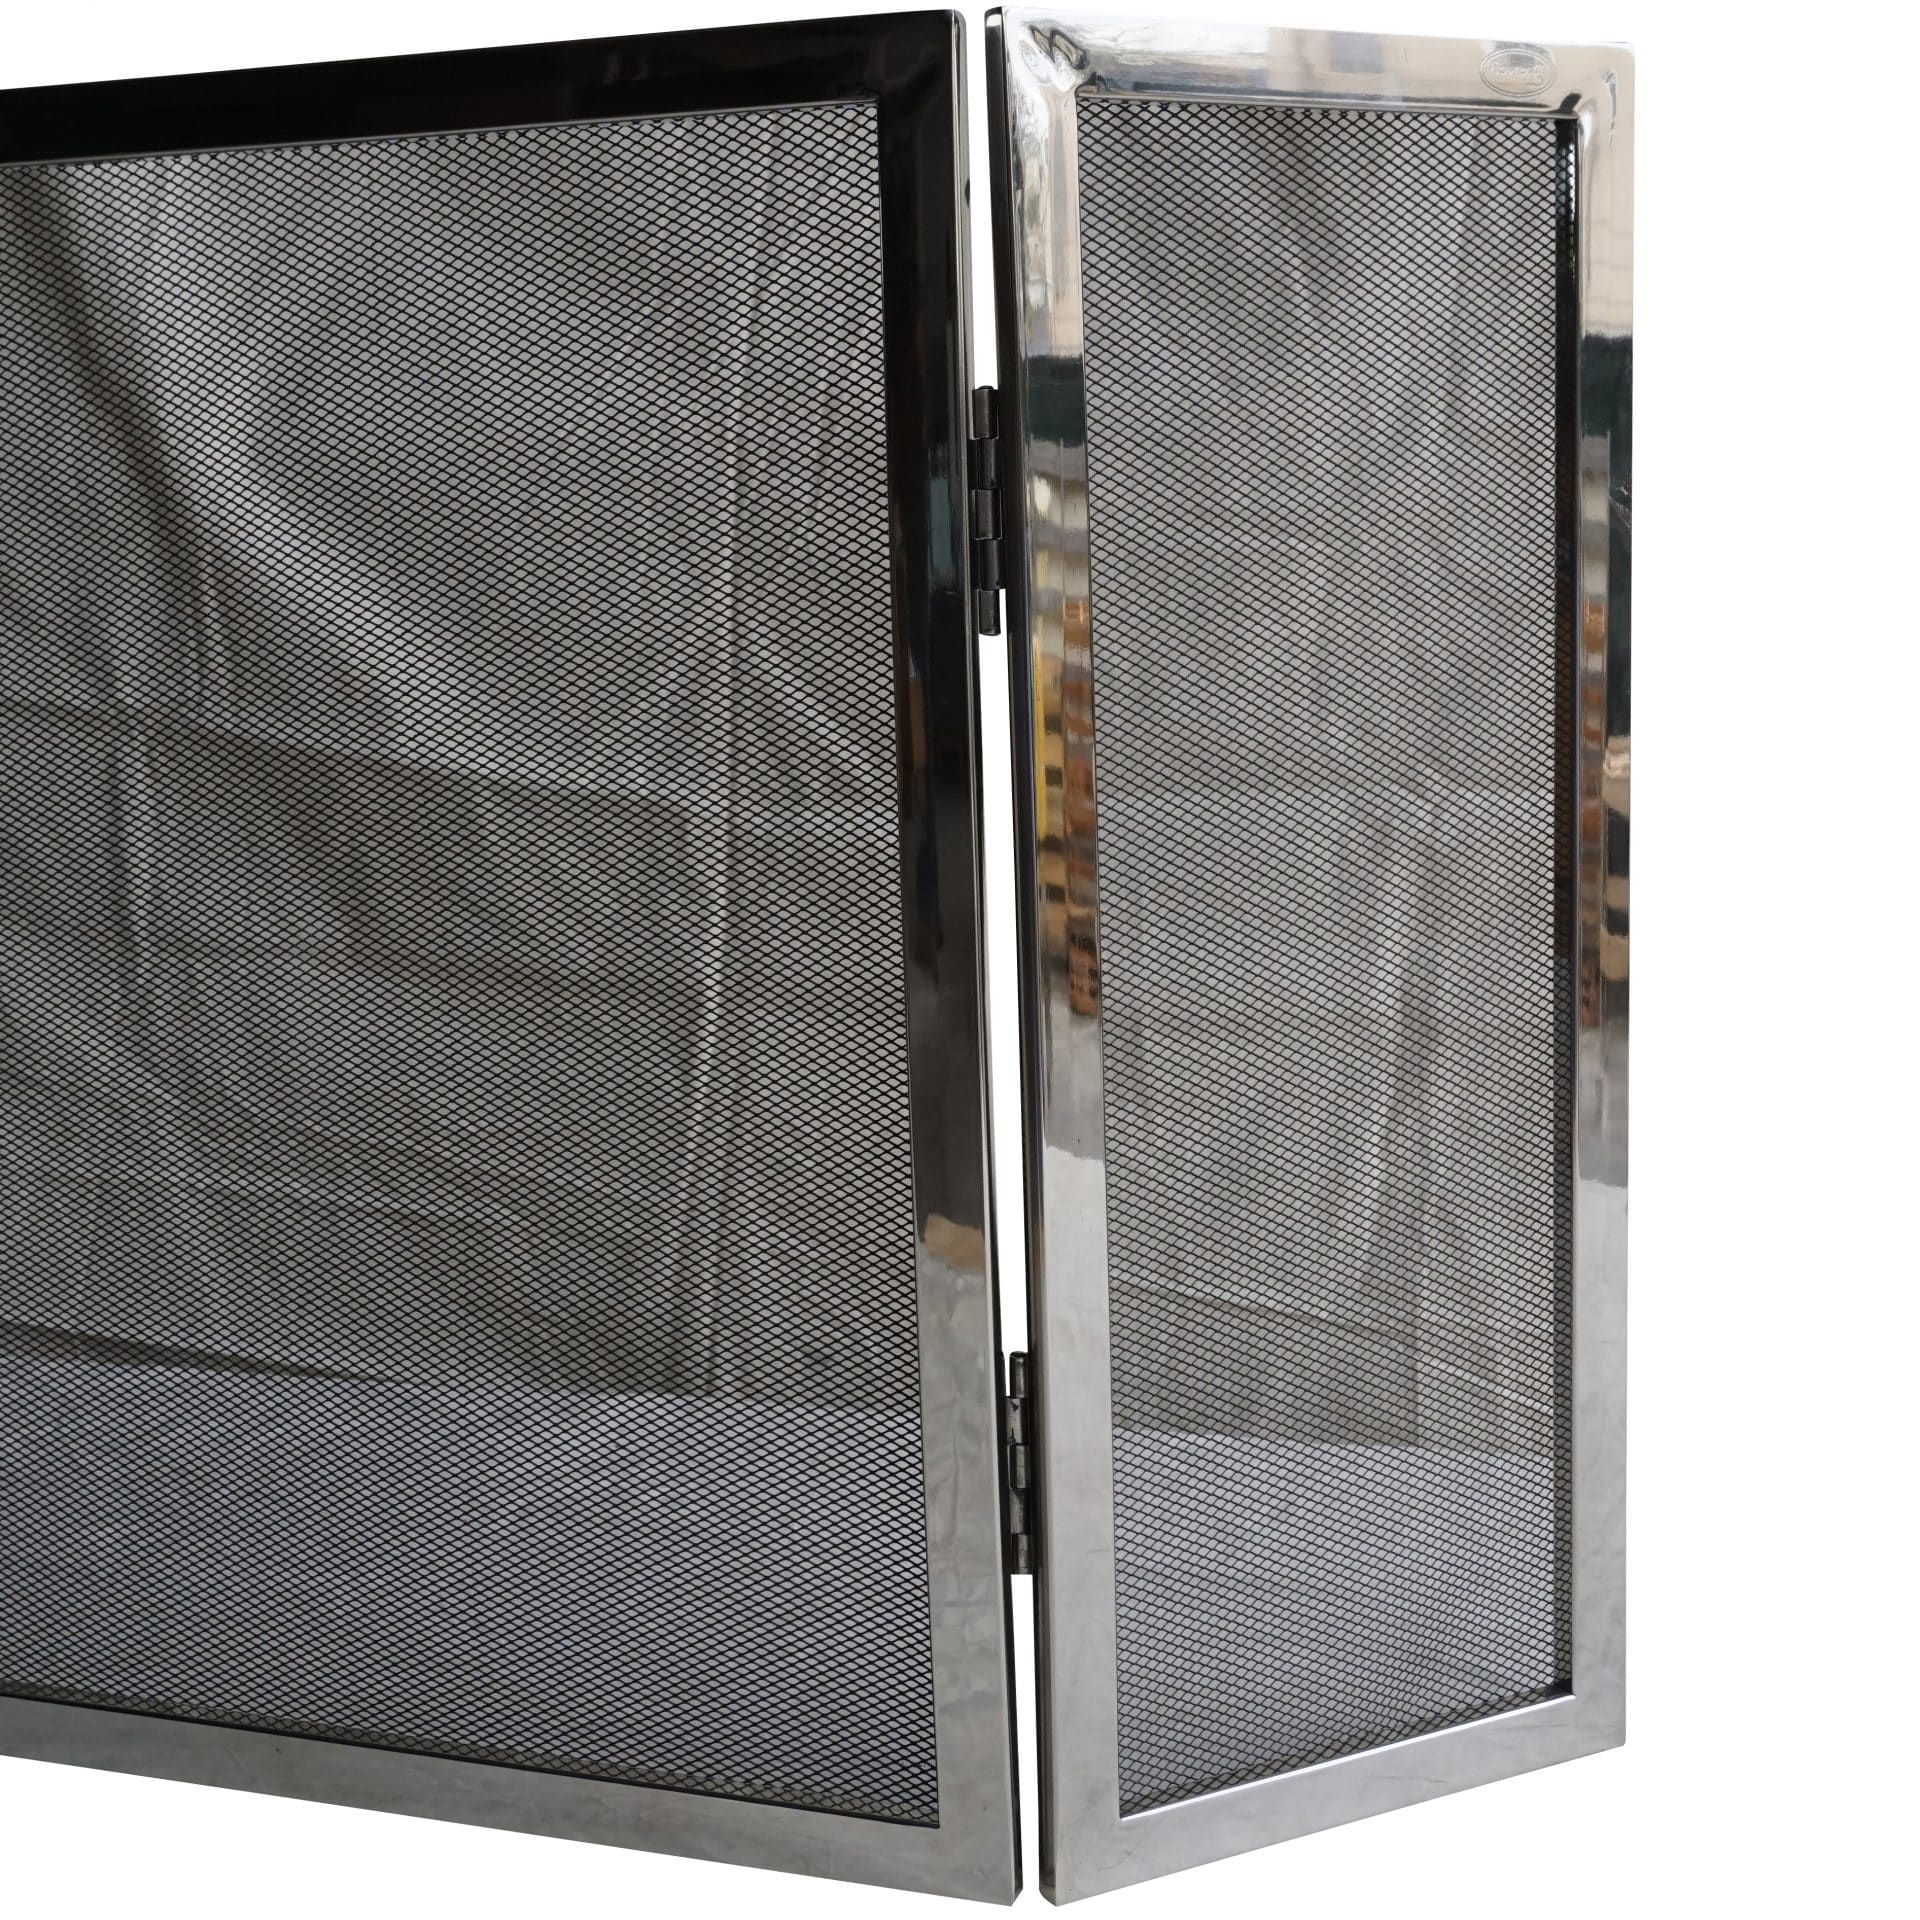 Muns Fireplace Screen